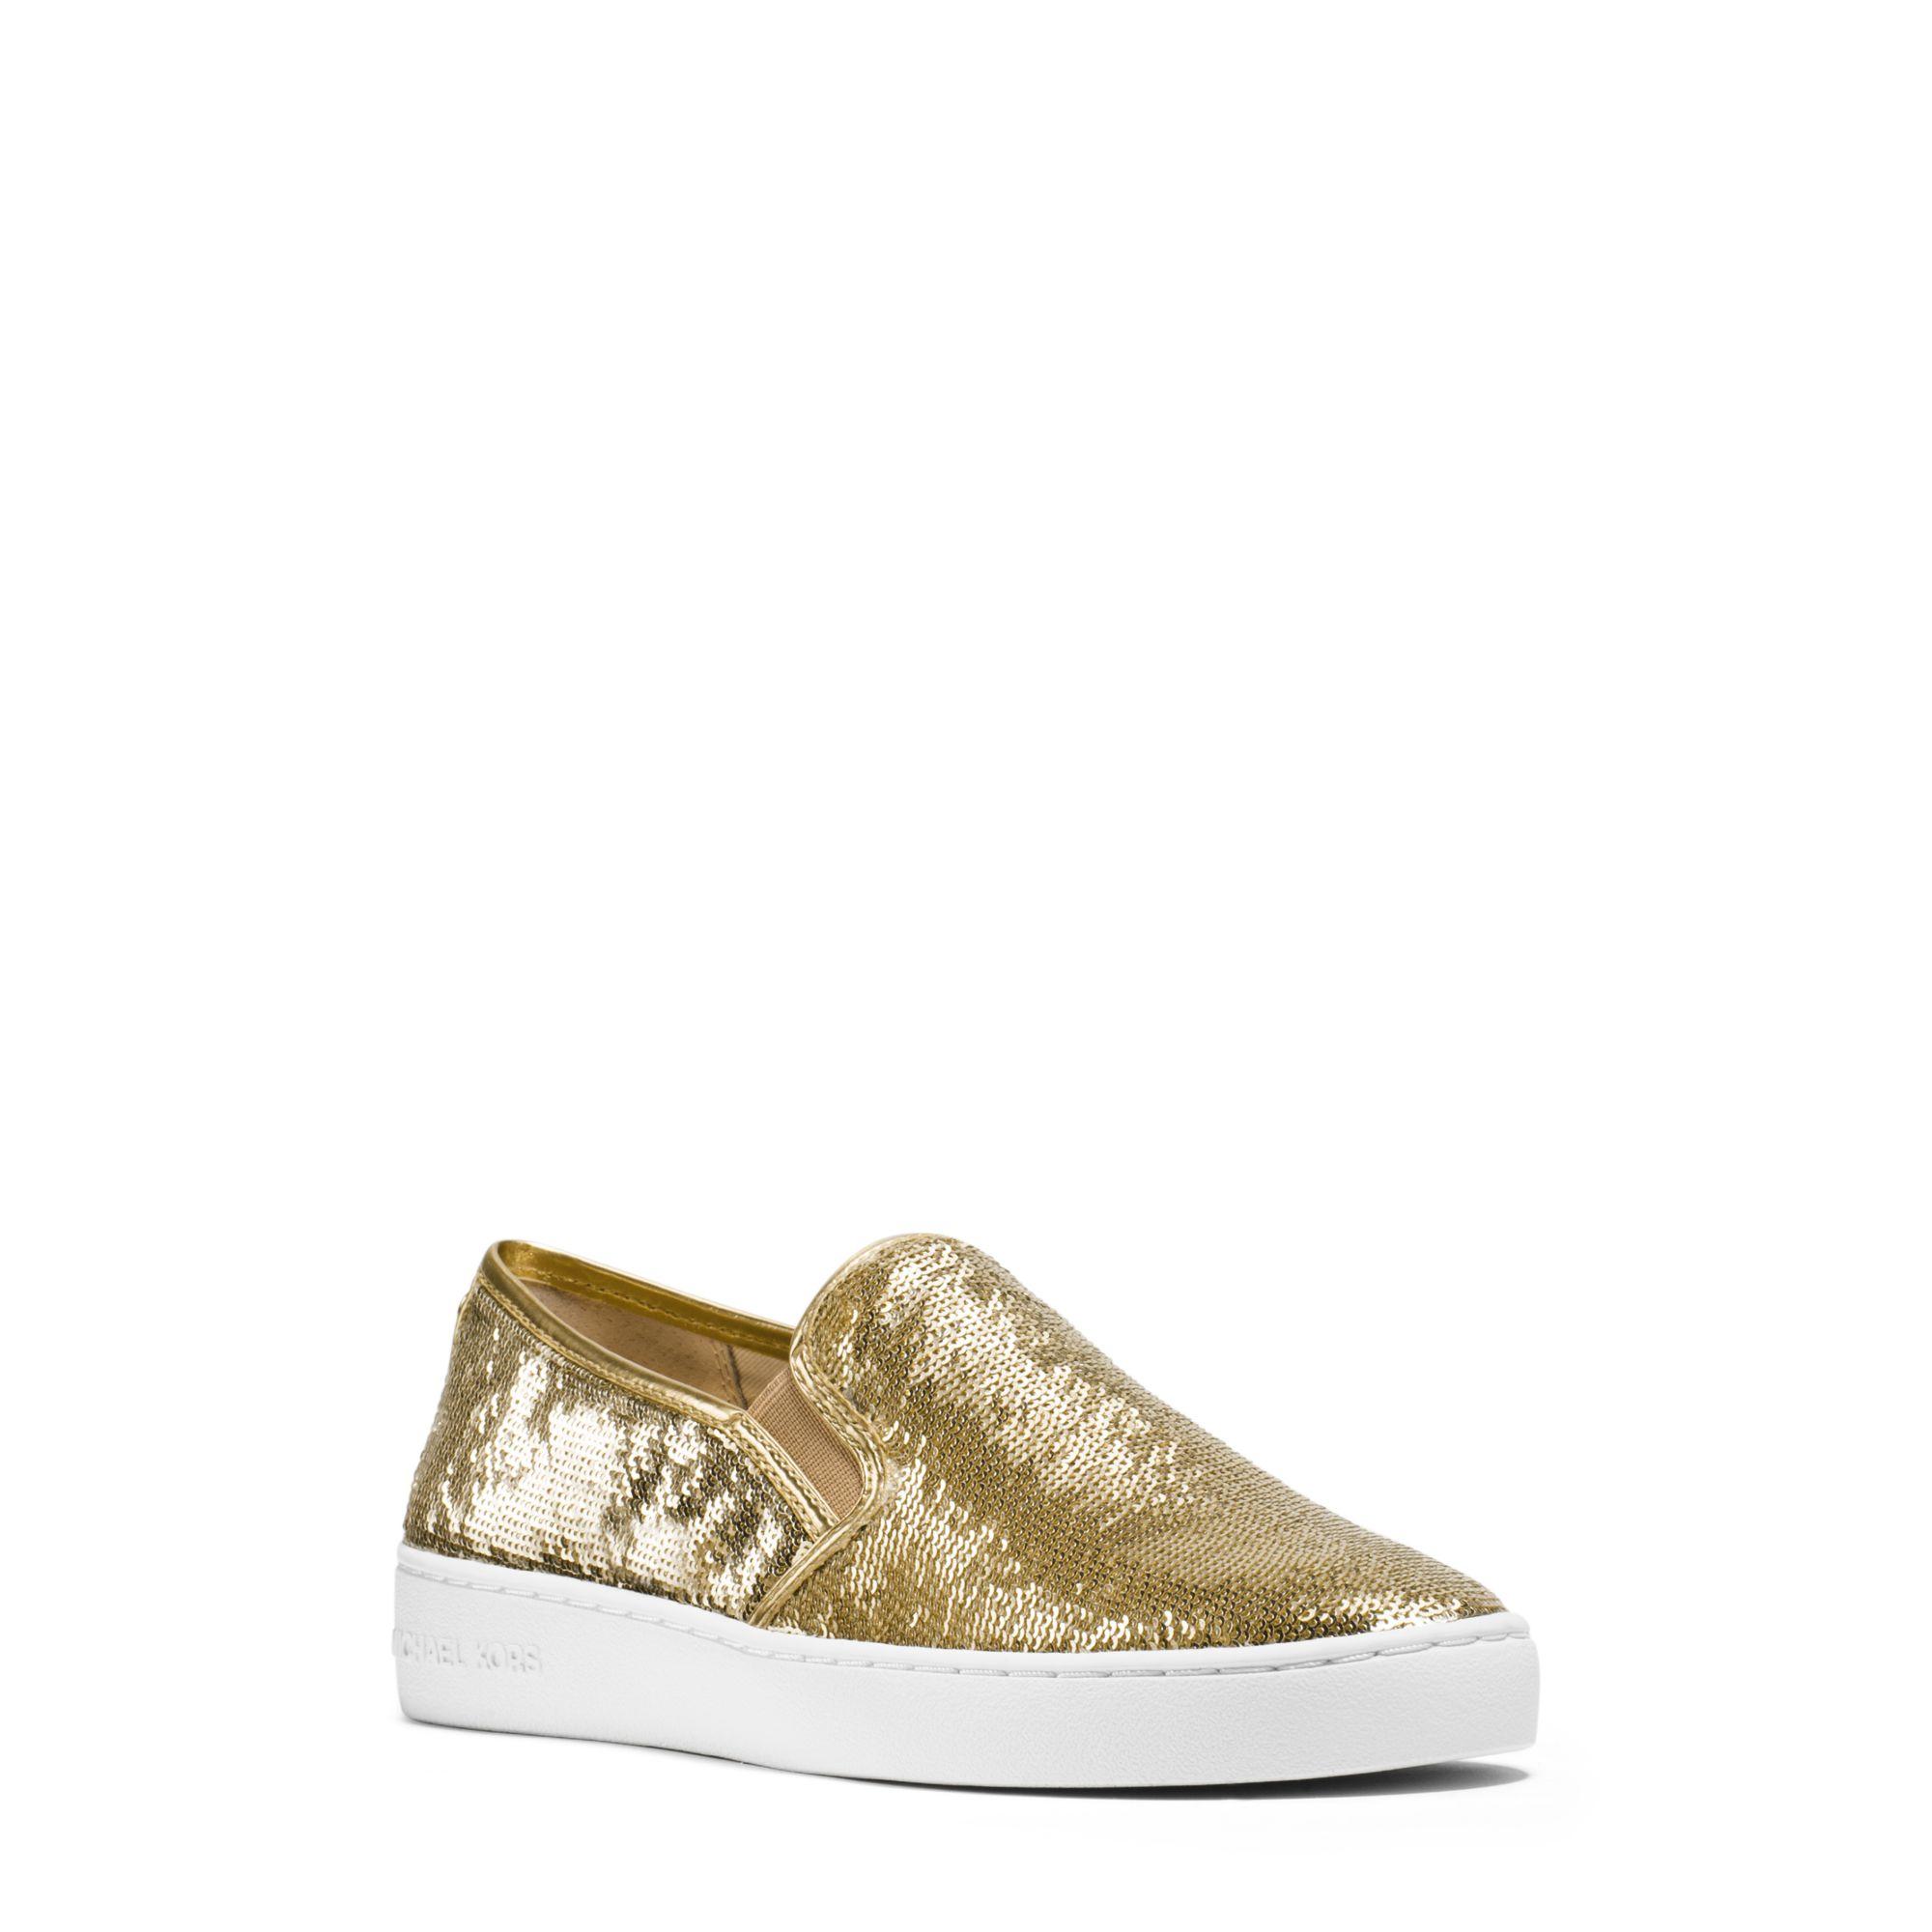 michael kors keaton sequined slip on sneaker in metallic lyst. Black Bedroom Furniture Sets. Home Design Ideas